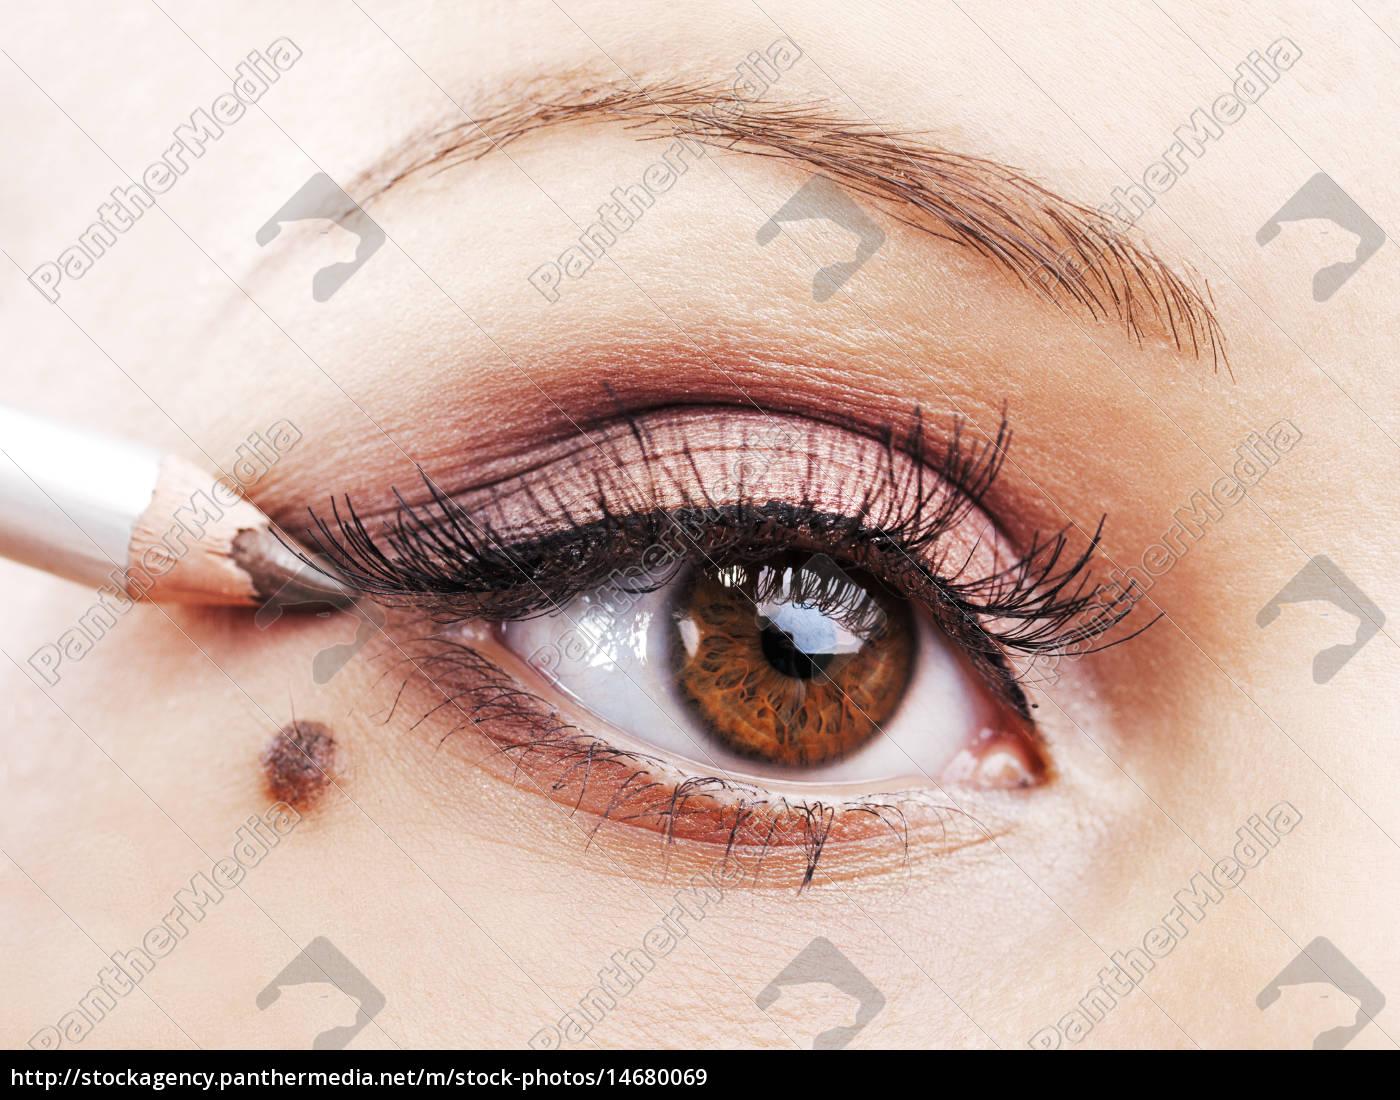 augen-make-up, augen-make-up, augen-make-up, applikation, eye-make-up, applikation, eye-make-up, applikation, von, augen-make-up, applikation, von - 14680069